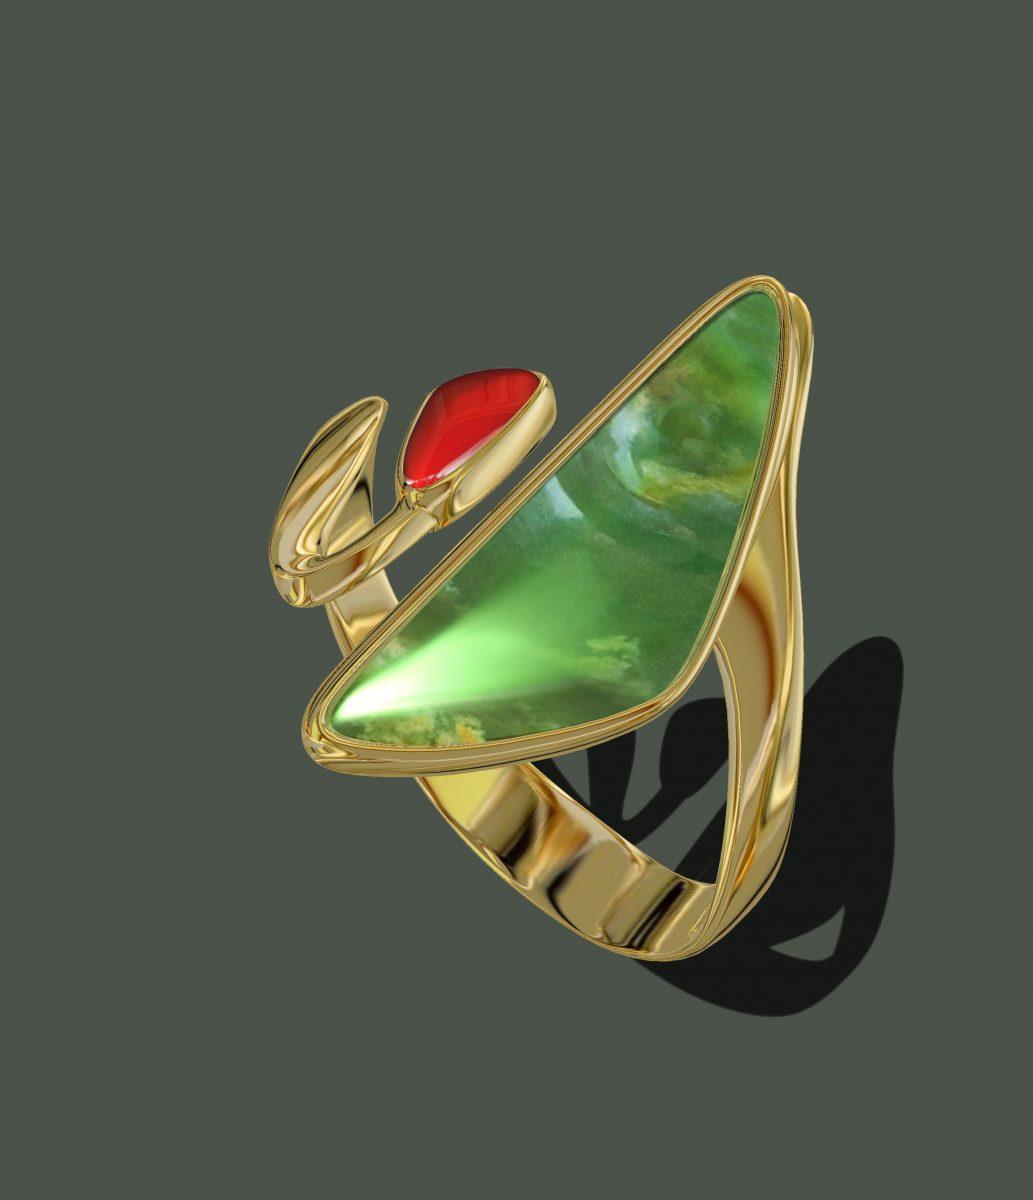 Jade & Carnelian Ring